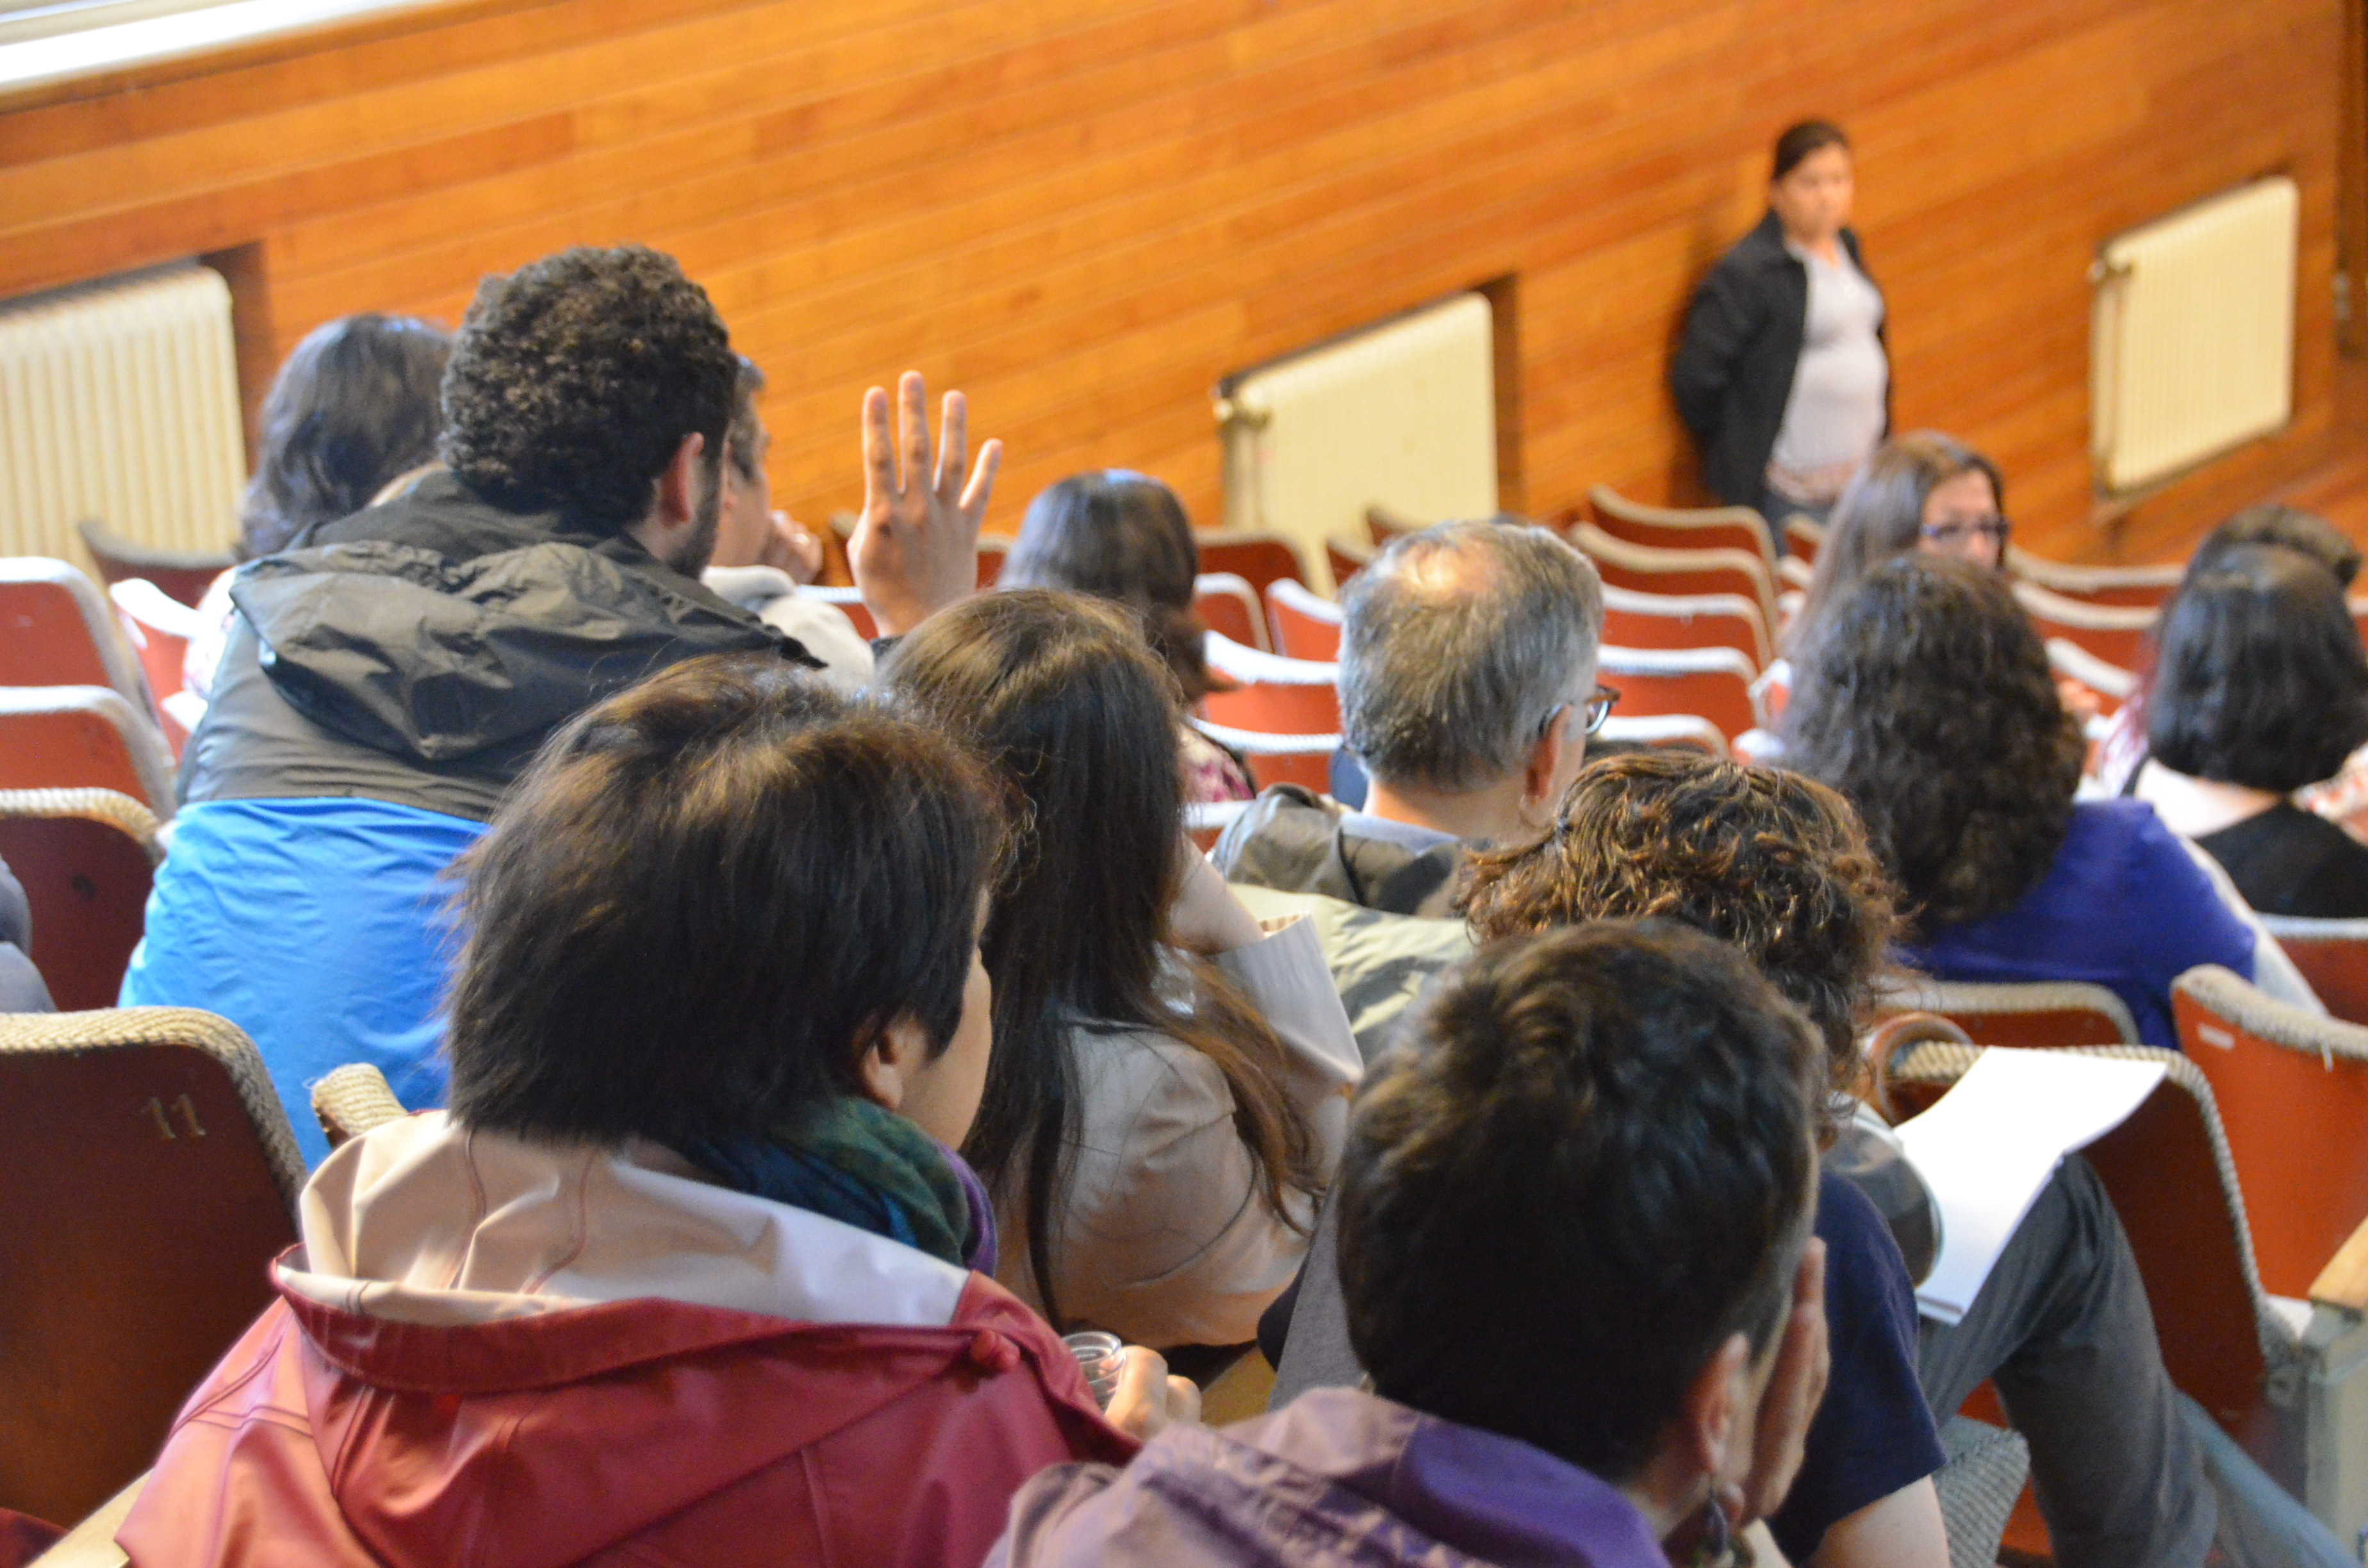 Esta mañana se realizó una nueva Asamblea General del Sindicato de Docentes de la UACh.